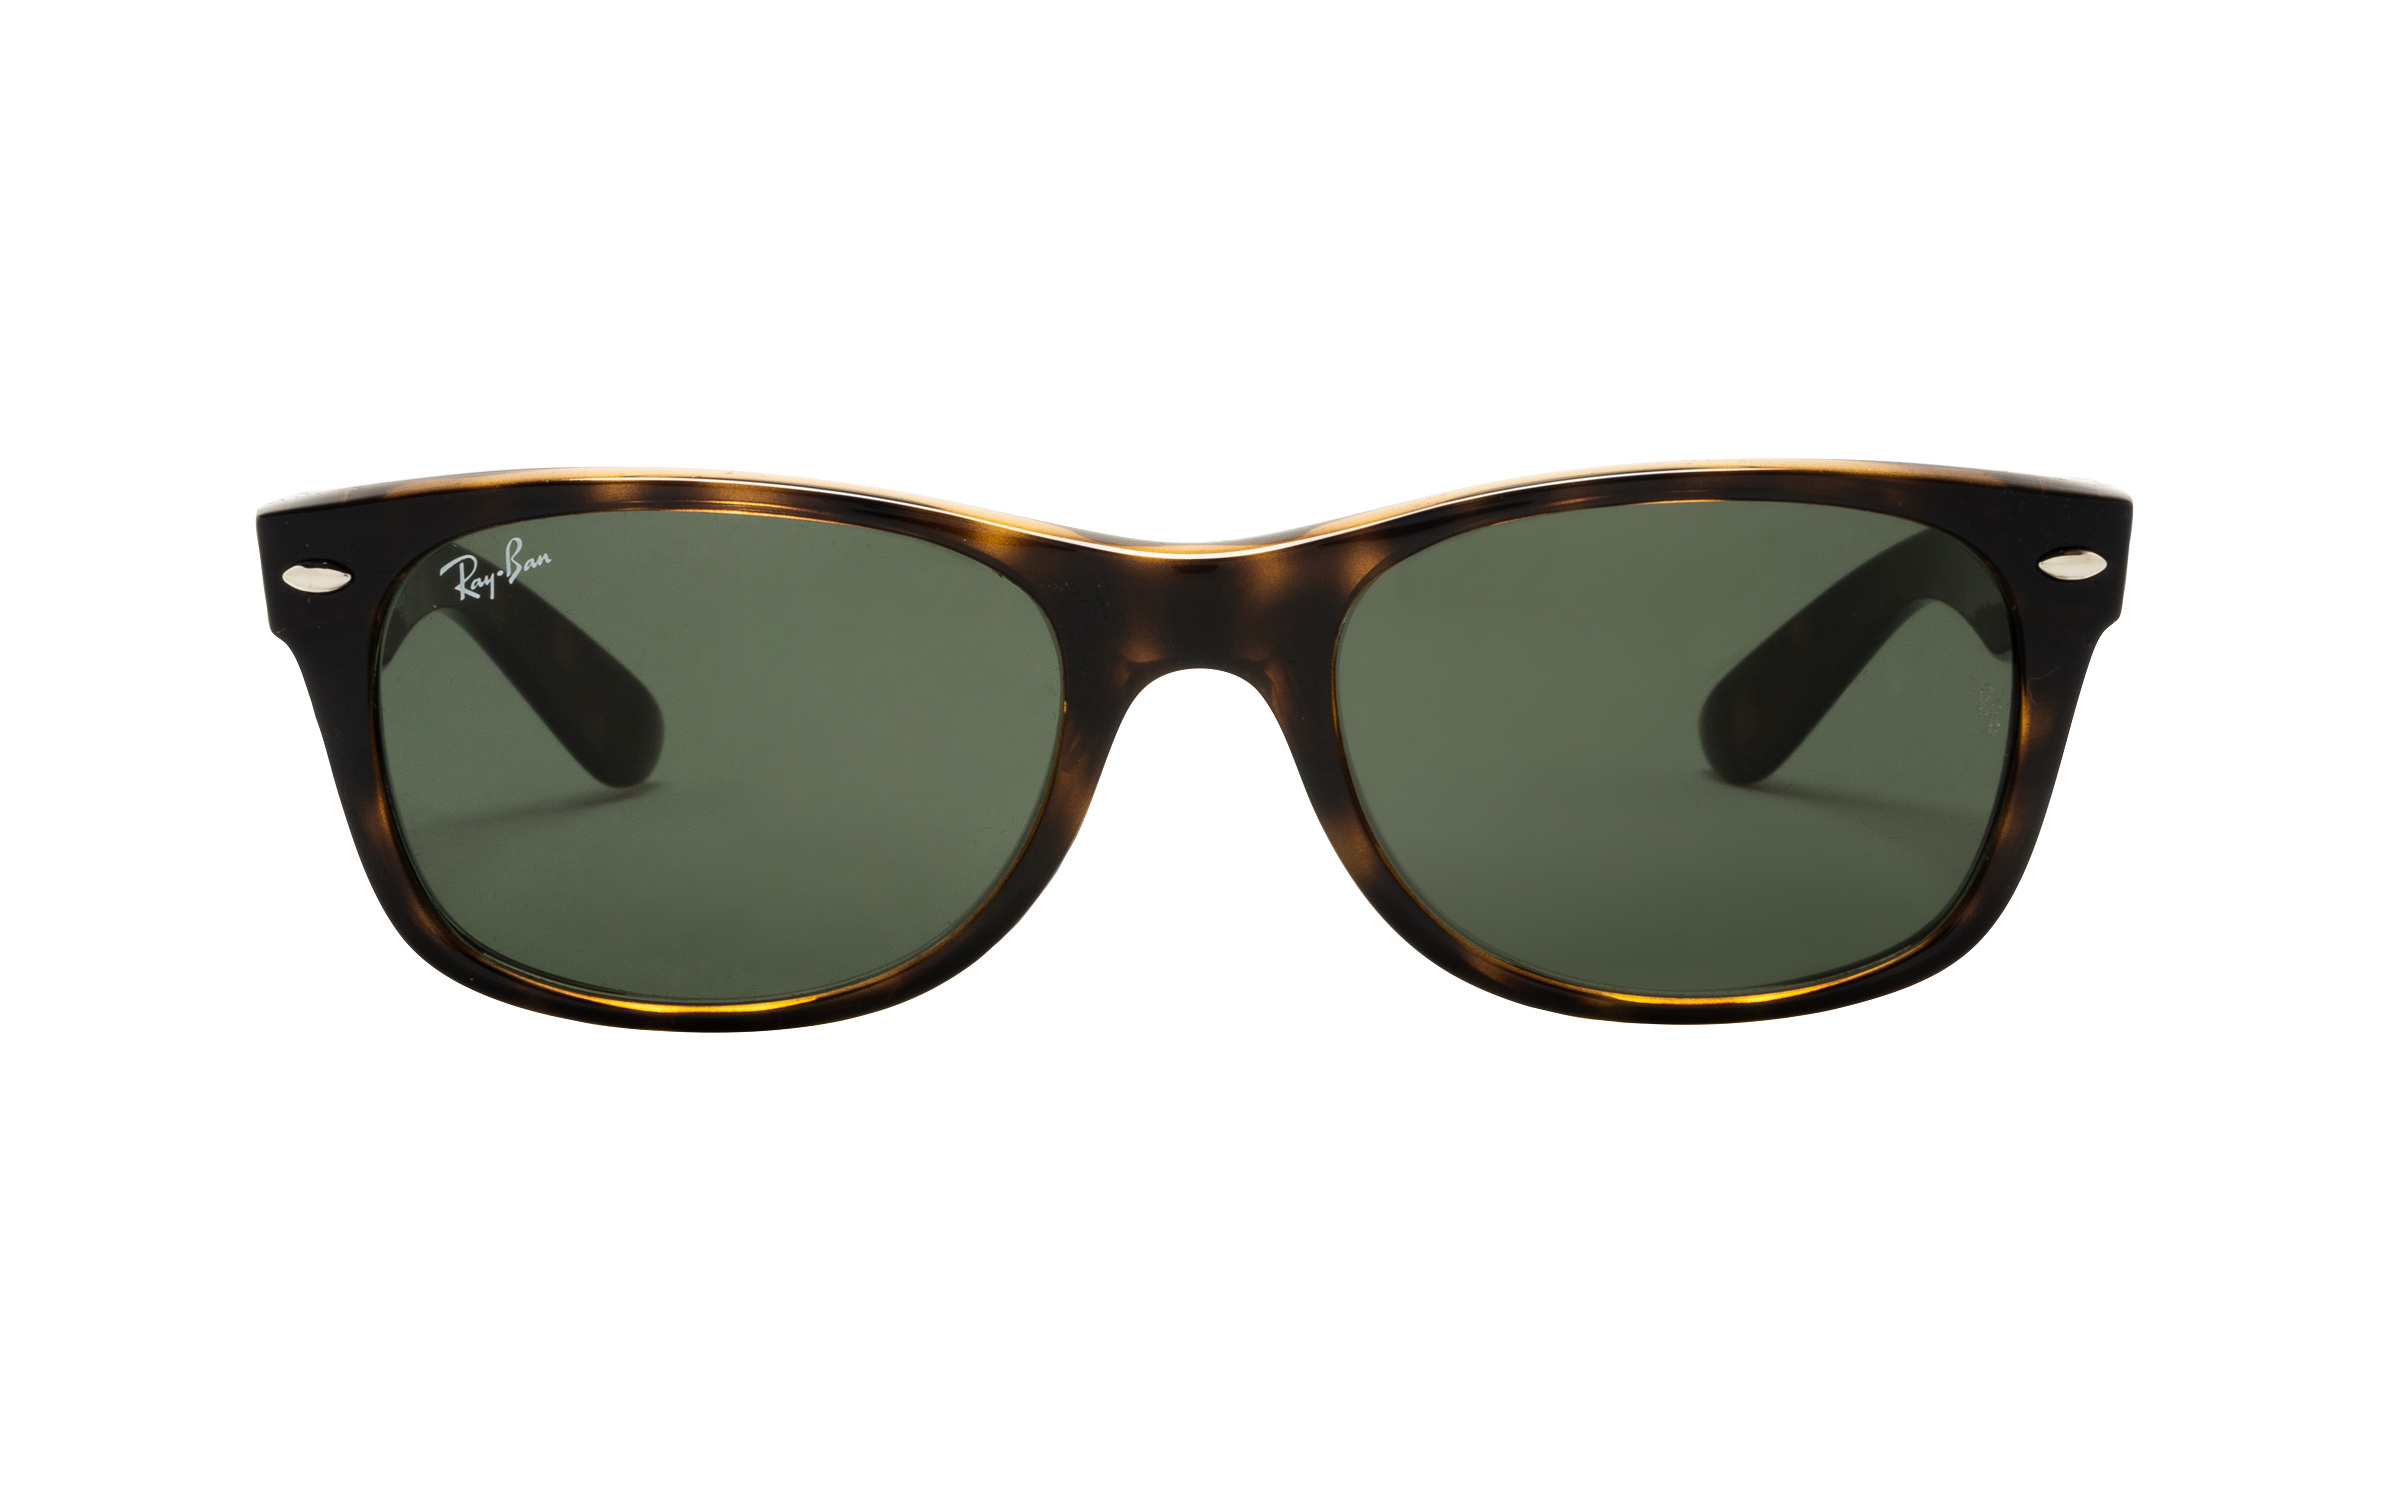 coastal.com - RayBan Ray-Ban RB2132 902 52 Sunglasses in Tortoise – Online Coastal 144.00 USD